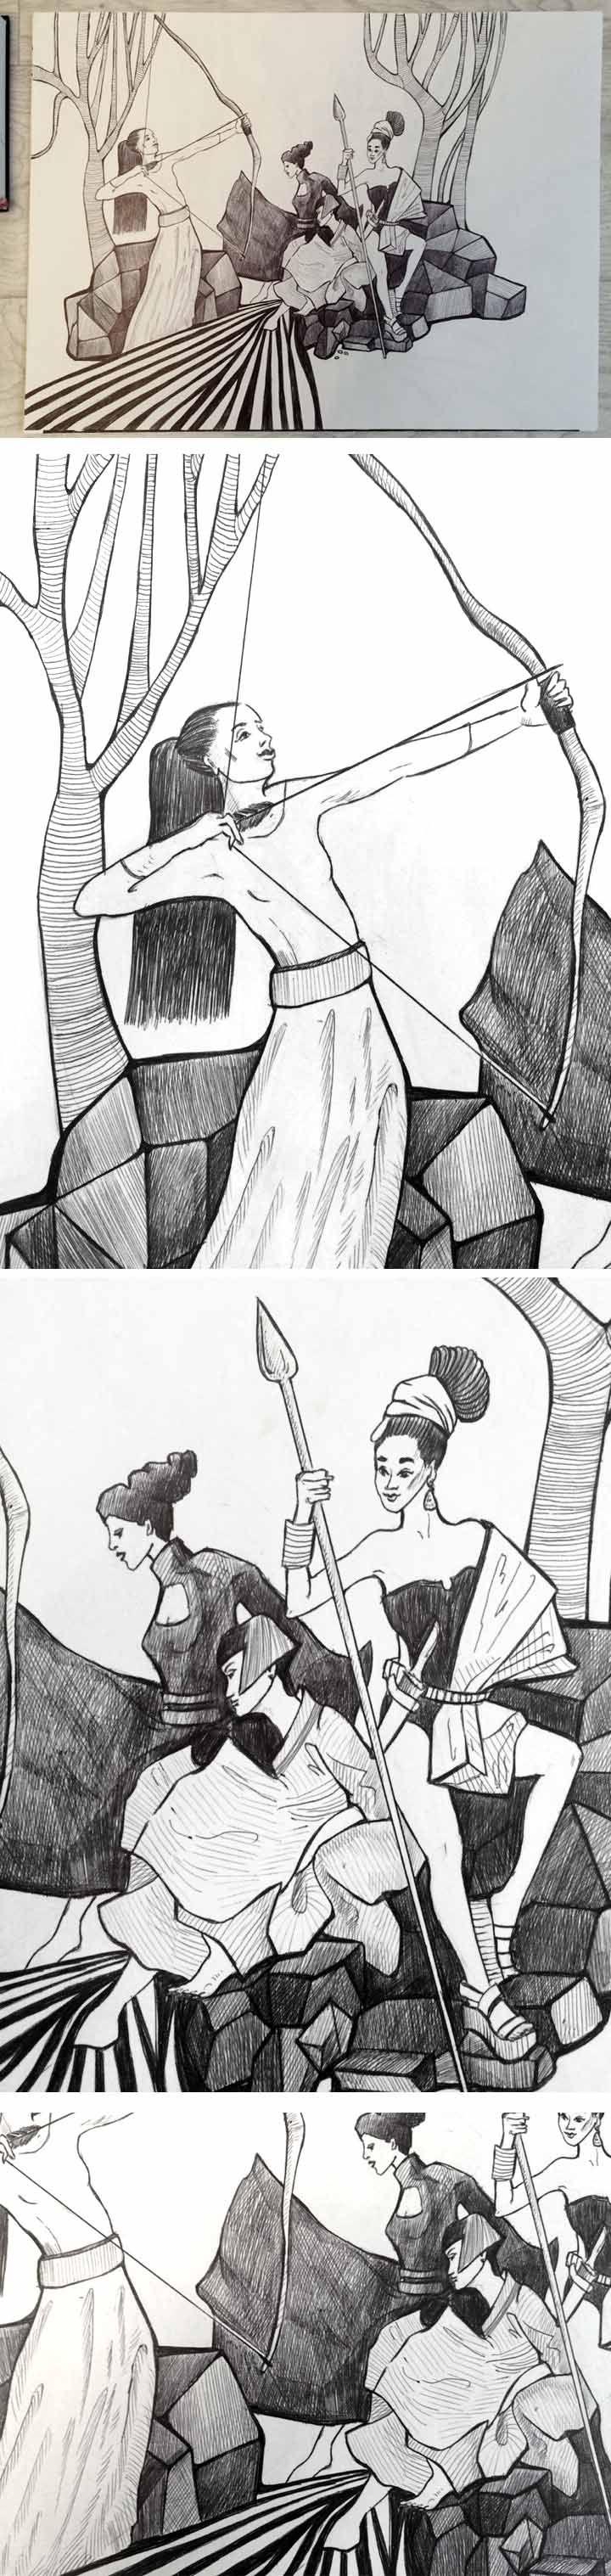 Графика на тему Подвиги Геракла. Девятый подвиг. Геракл завоёвывает пояс Ипполиты.  The graphics on the theme of The Labours of Hercules . Ninth feat. Hercules wins the belt Hippolyta . #graphic #arts #drawing #idea #amazon #human #girl  #weapon #myth  #fairytale #history  feat